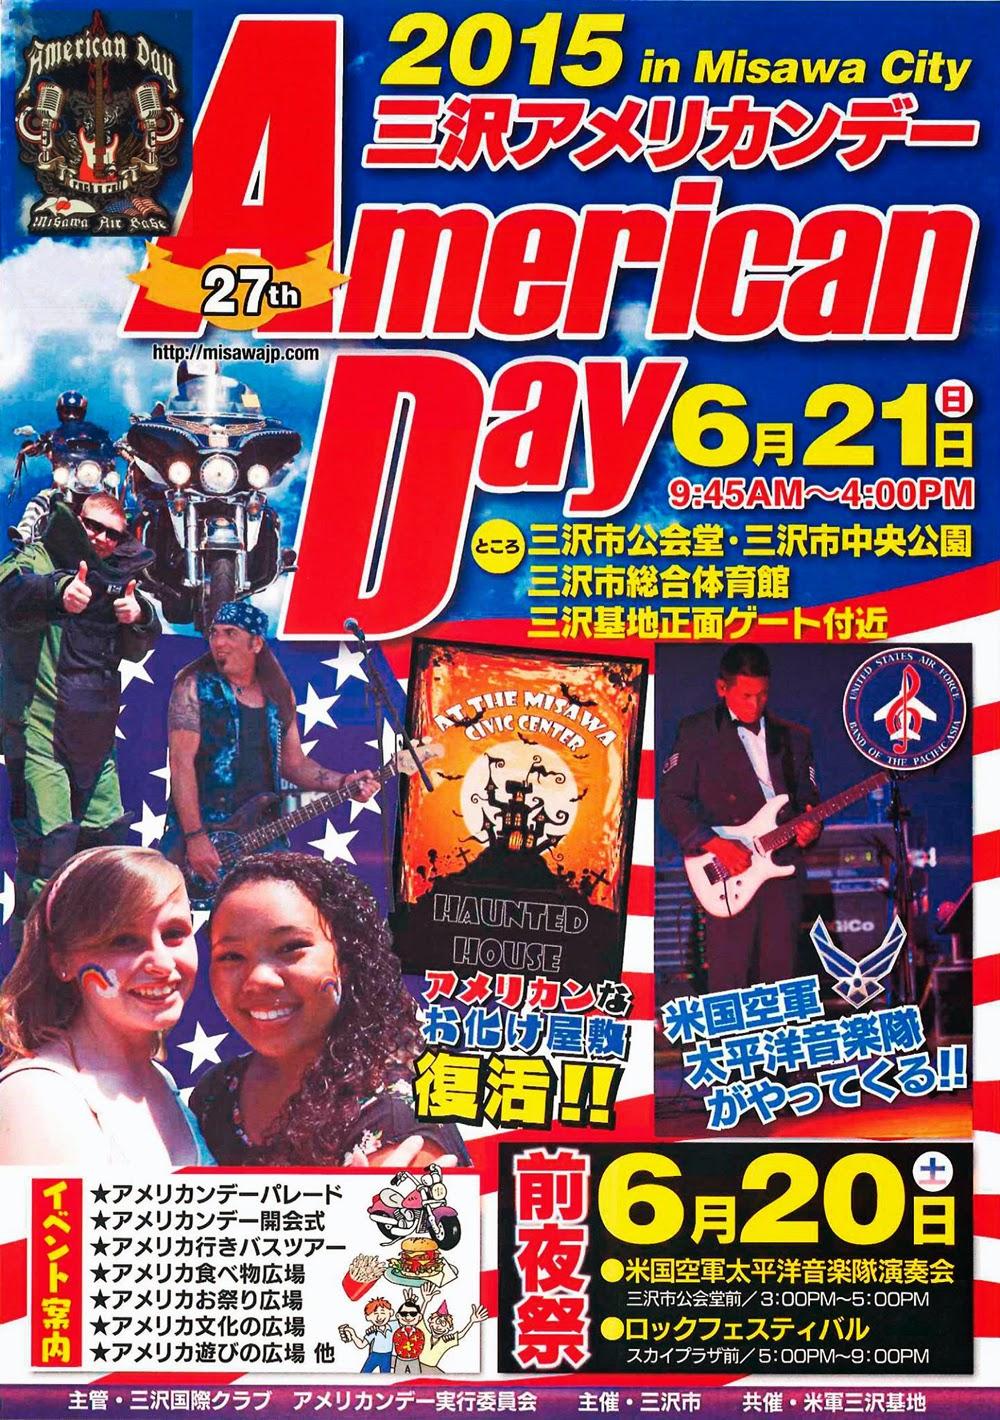 towada and beyond misawa american day 2015